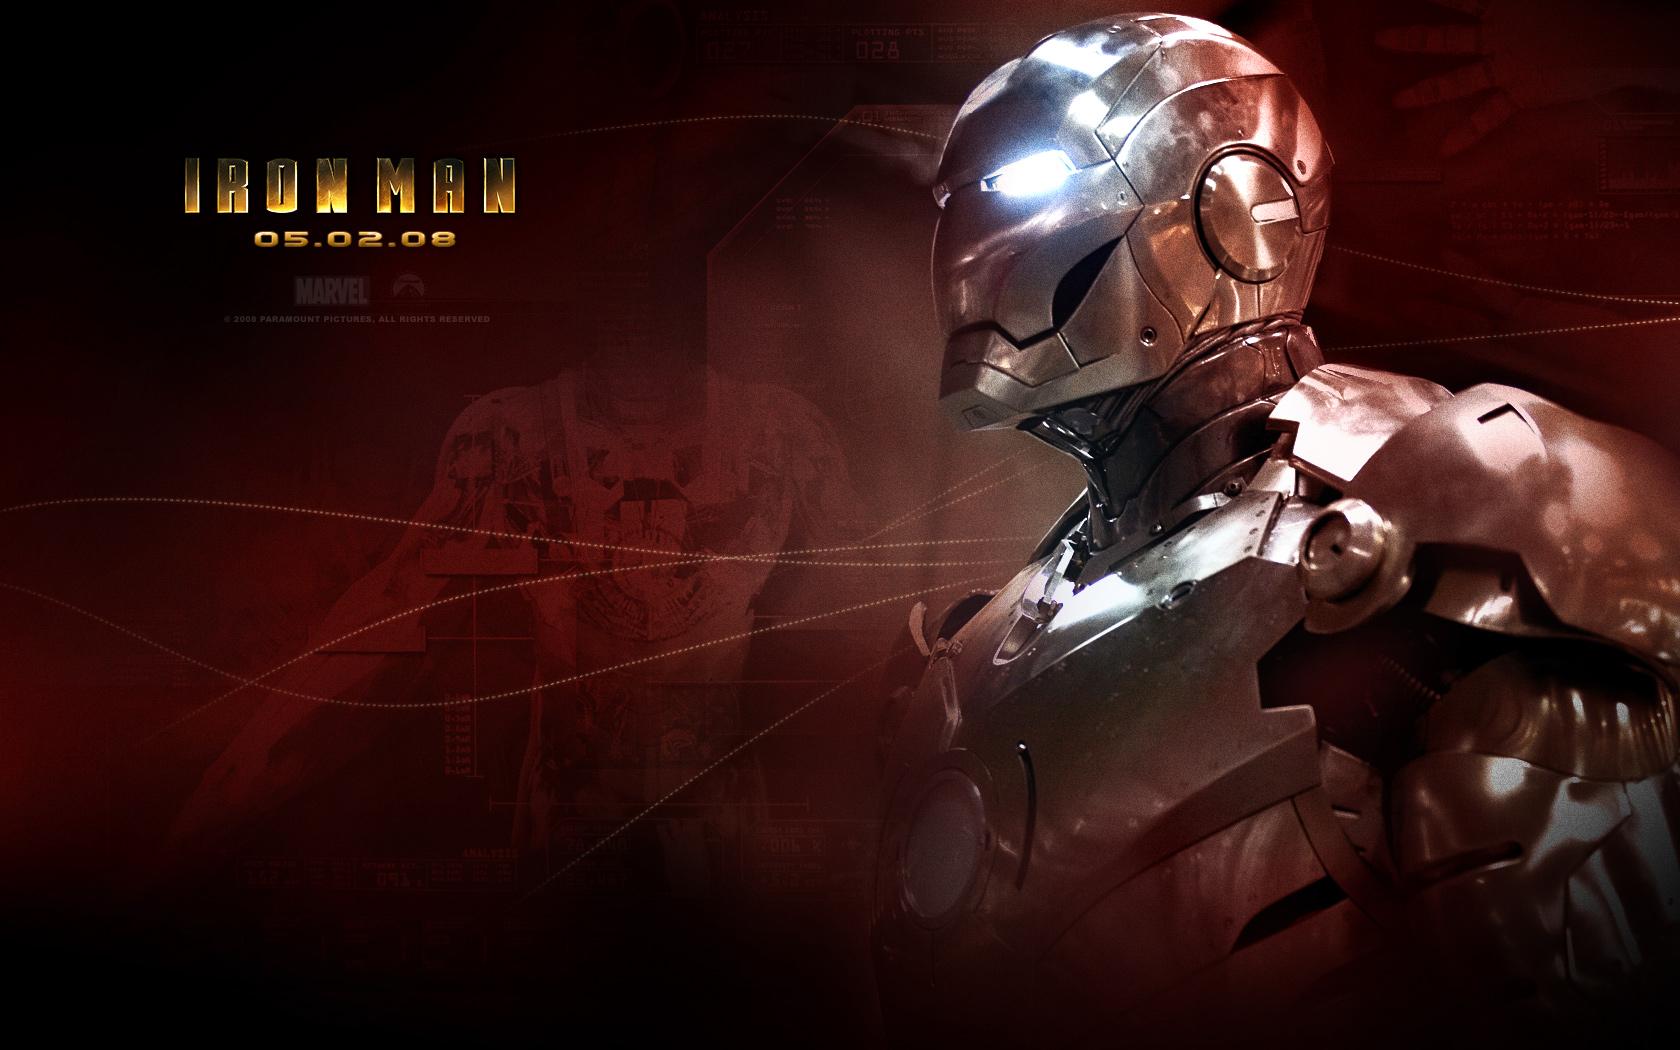 Iron Man wallpaper 9